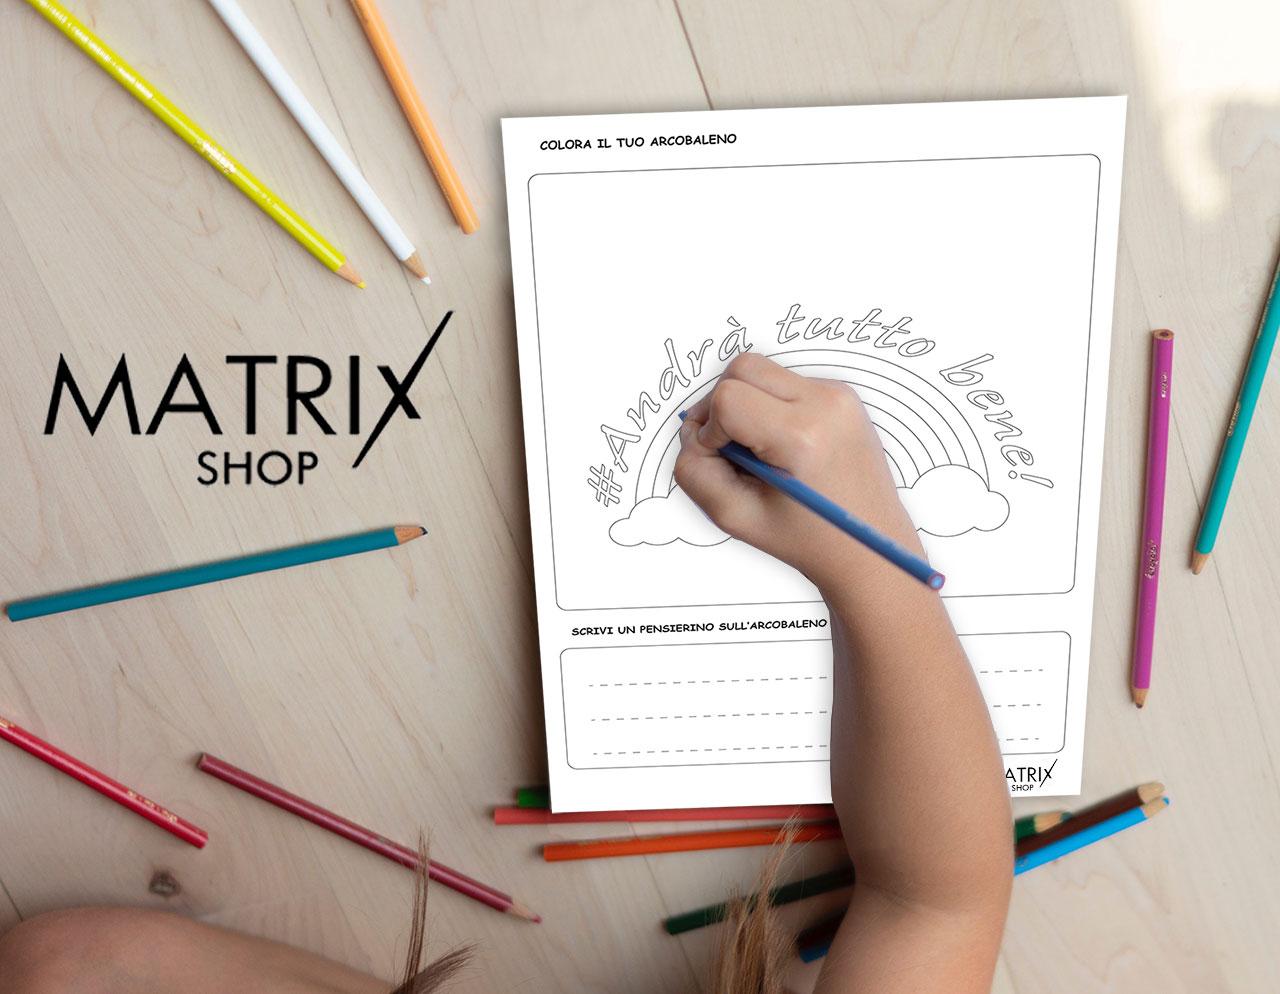 Colora con noi l'Arcobaleno Matrix Shop